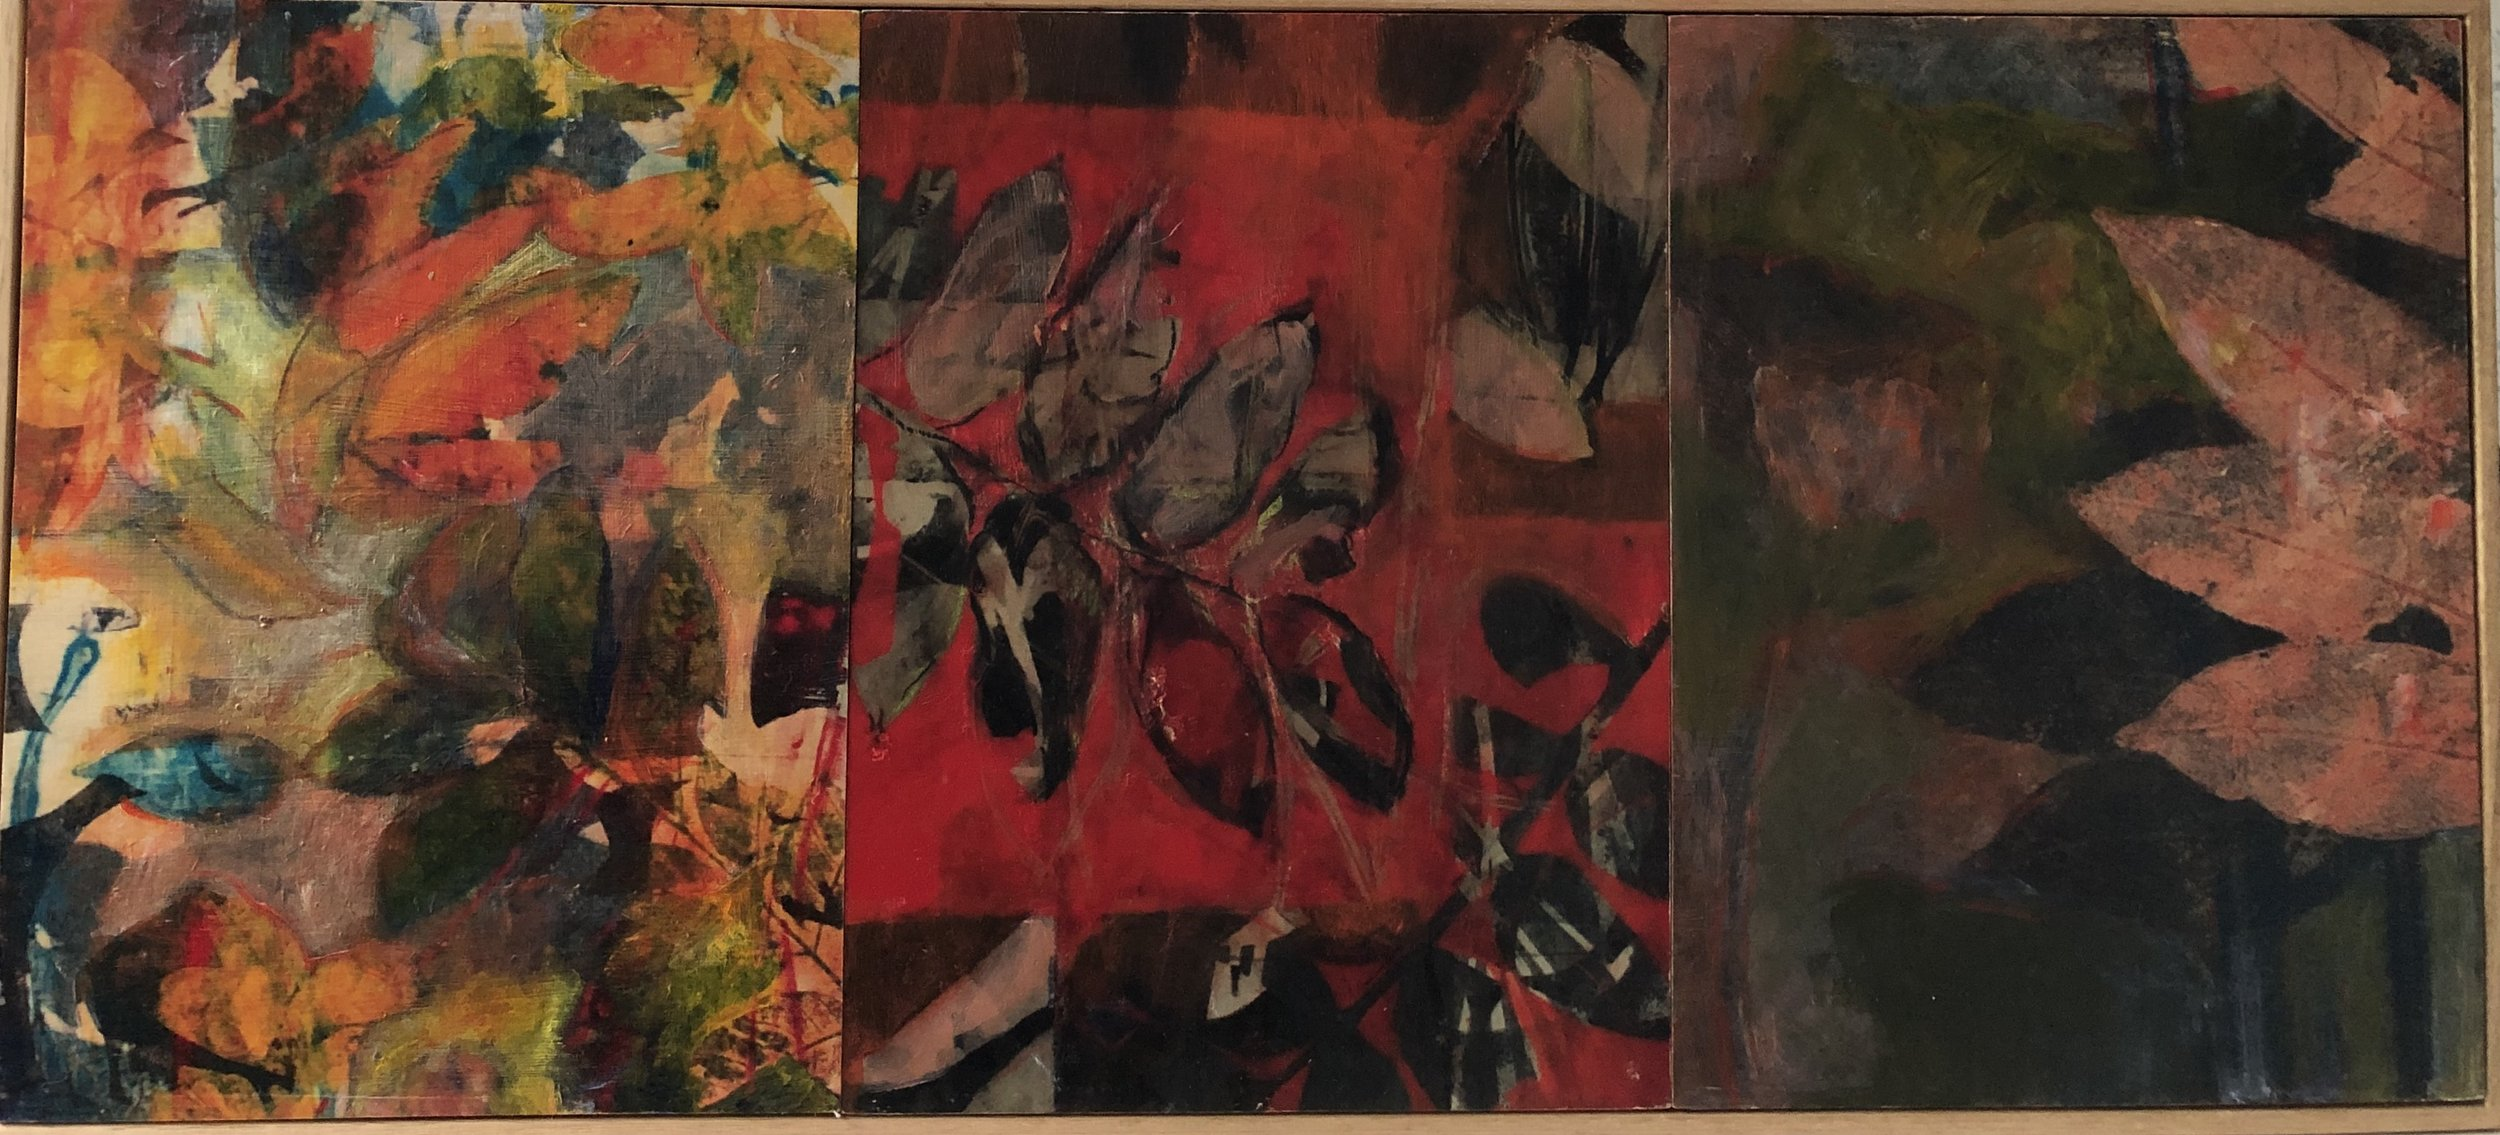 Helene Leane  Autumn (leaves)  2019 mixed media on board 32 x 70cm frame $550.00